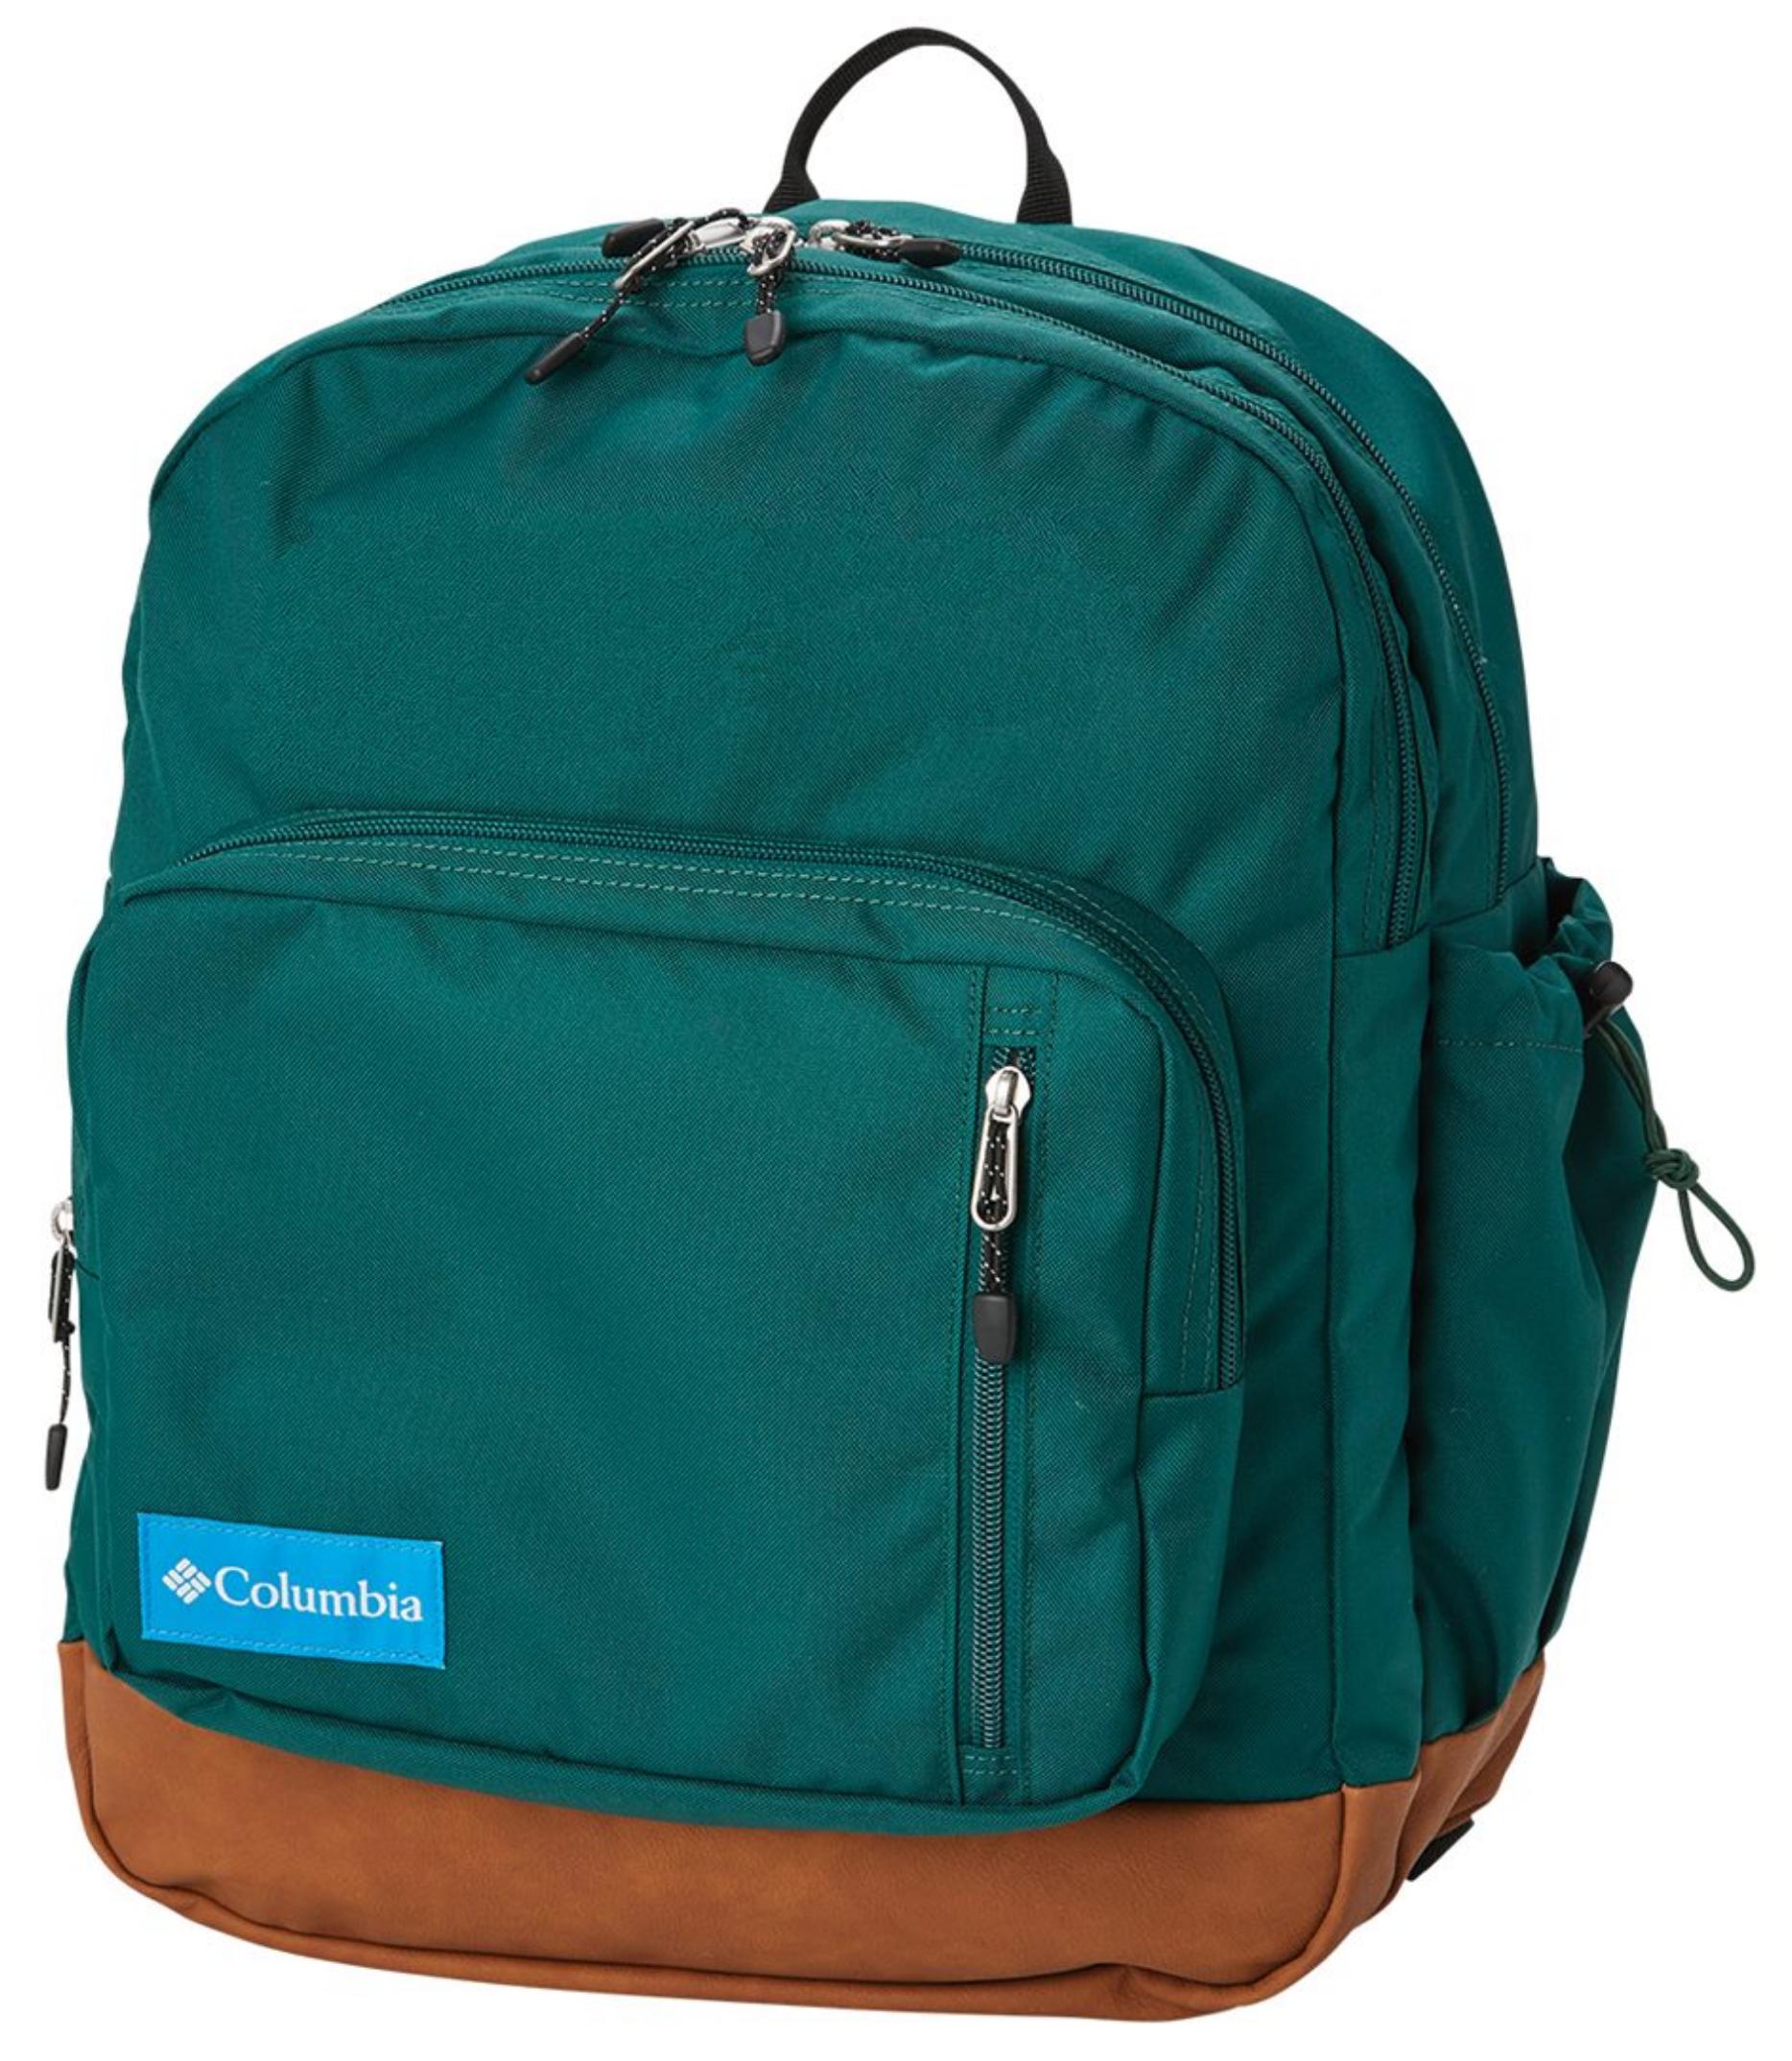 Columbia - 35L Backpack